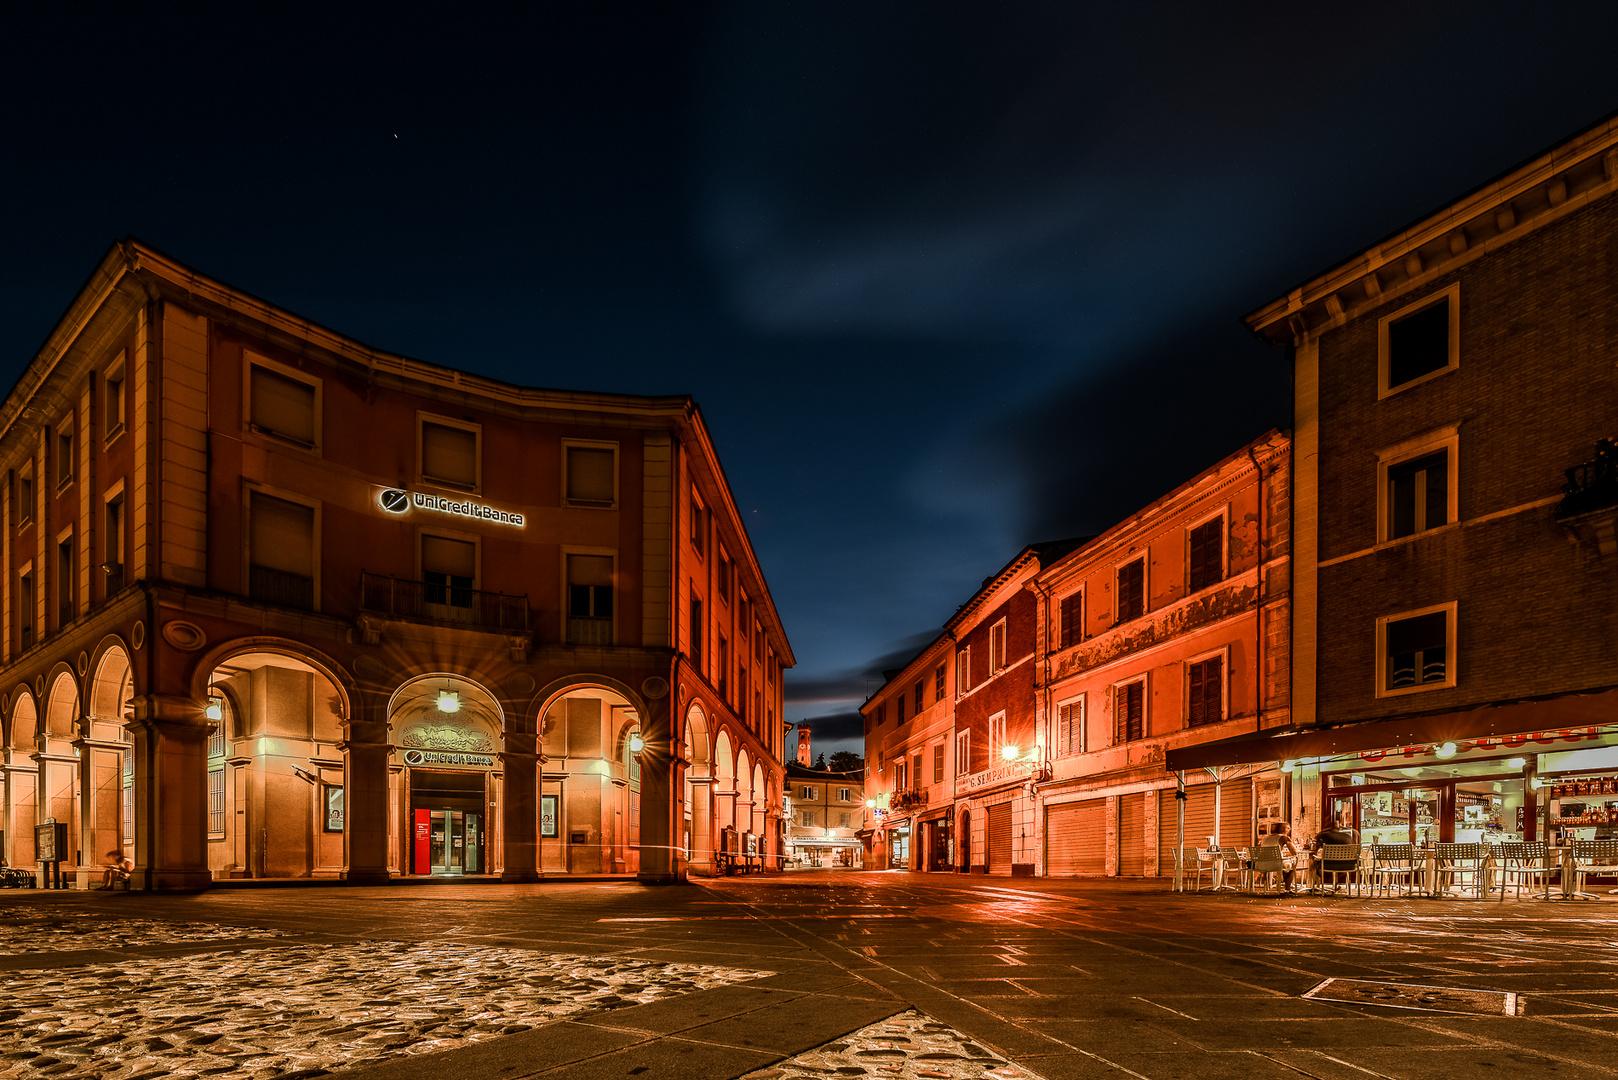 ...Notturno in piazza...